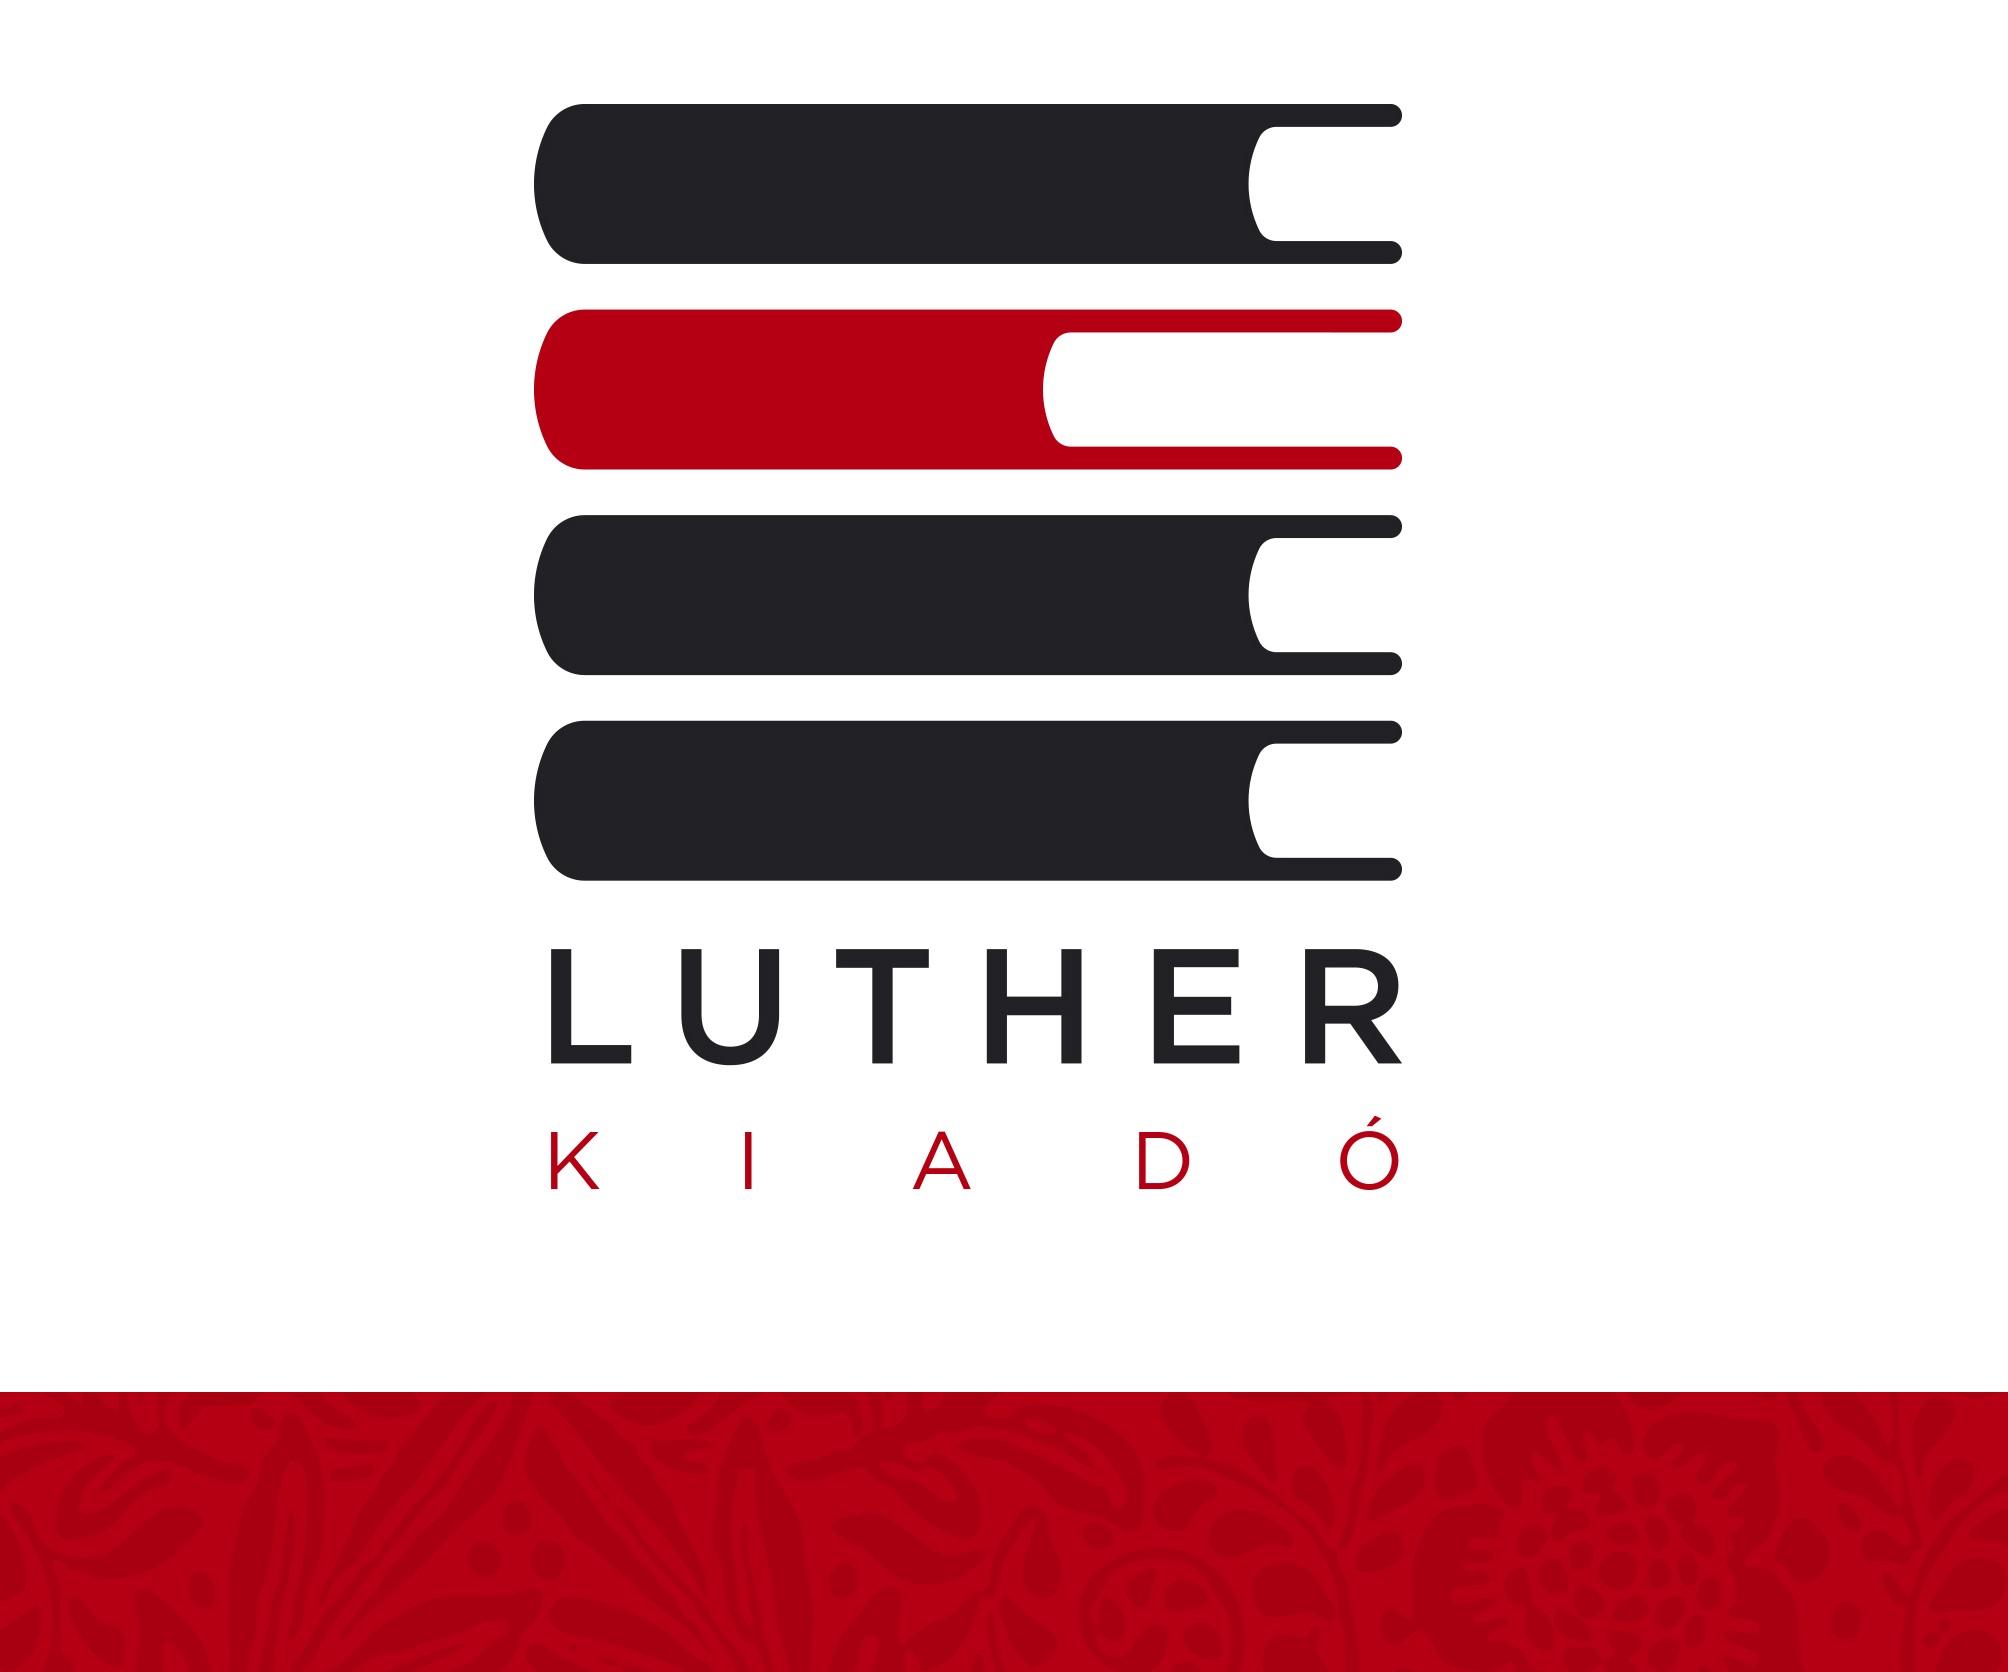 luther_kiado_1.jpg